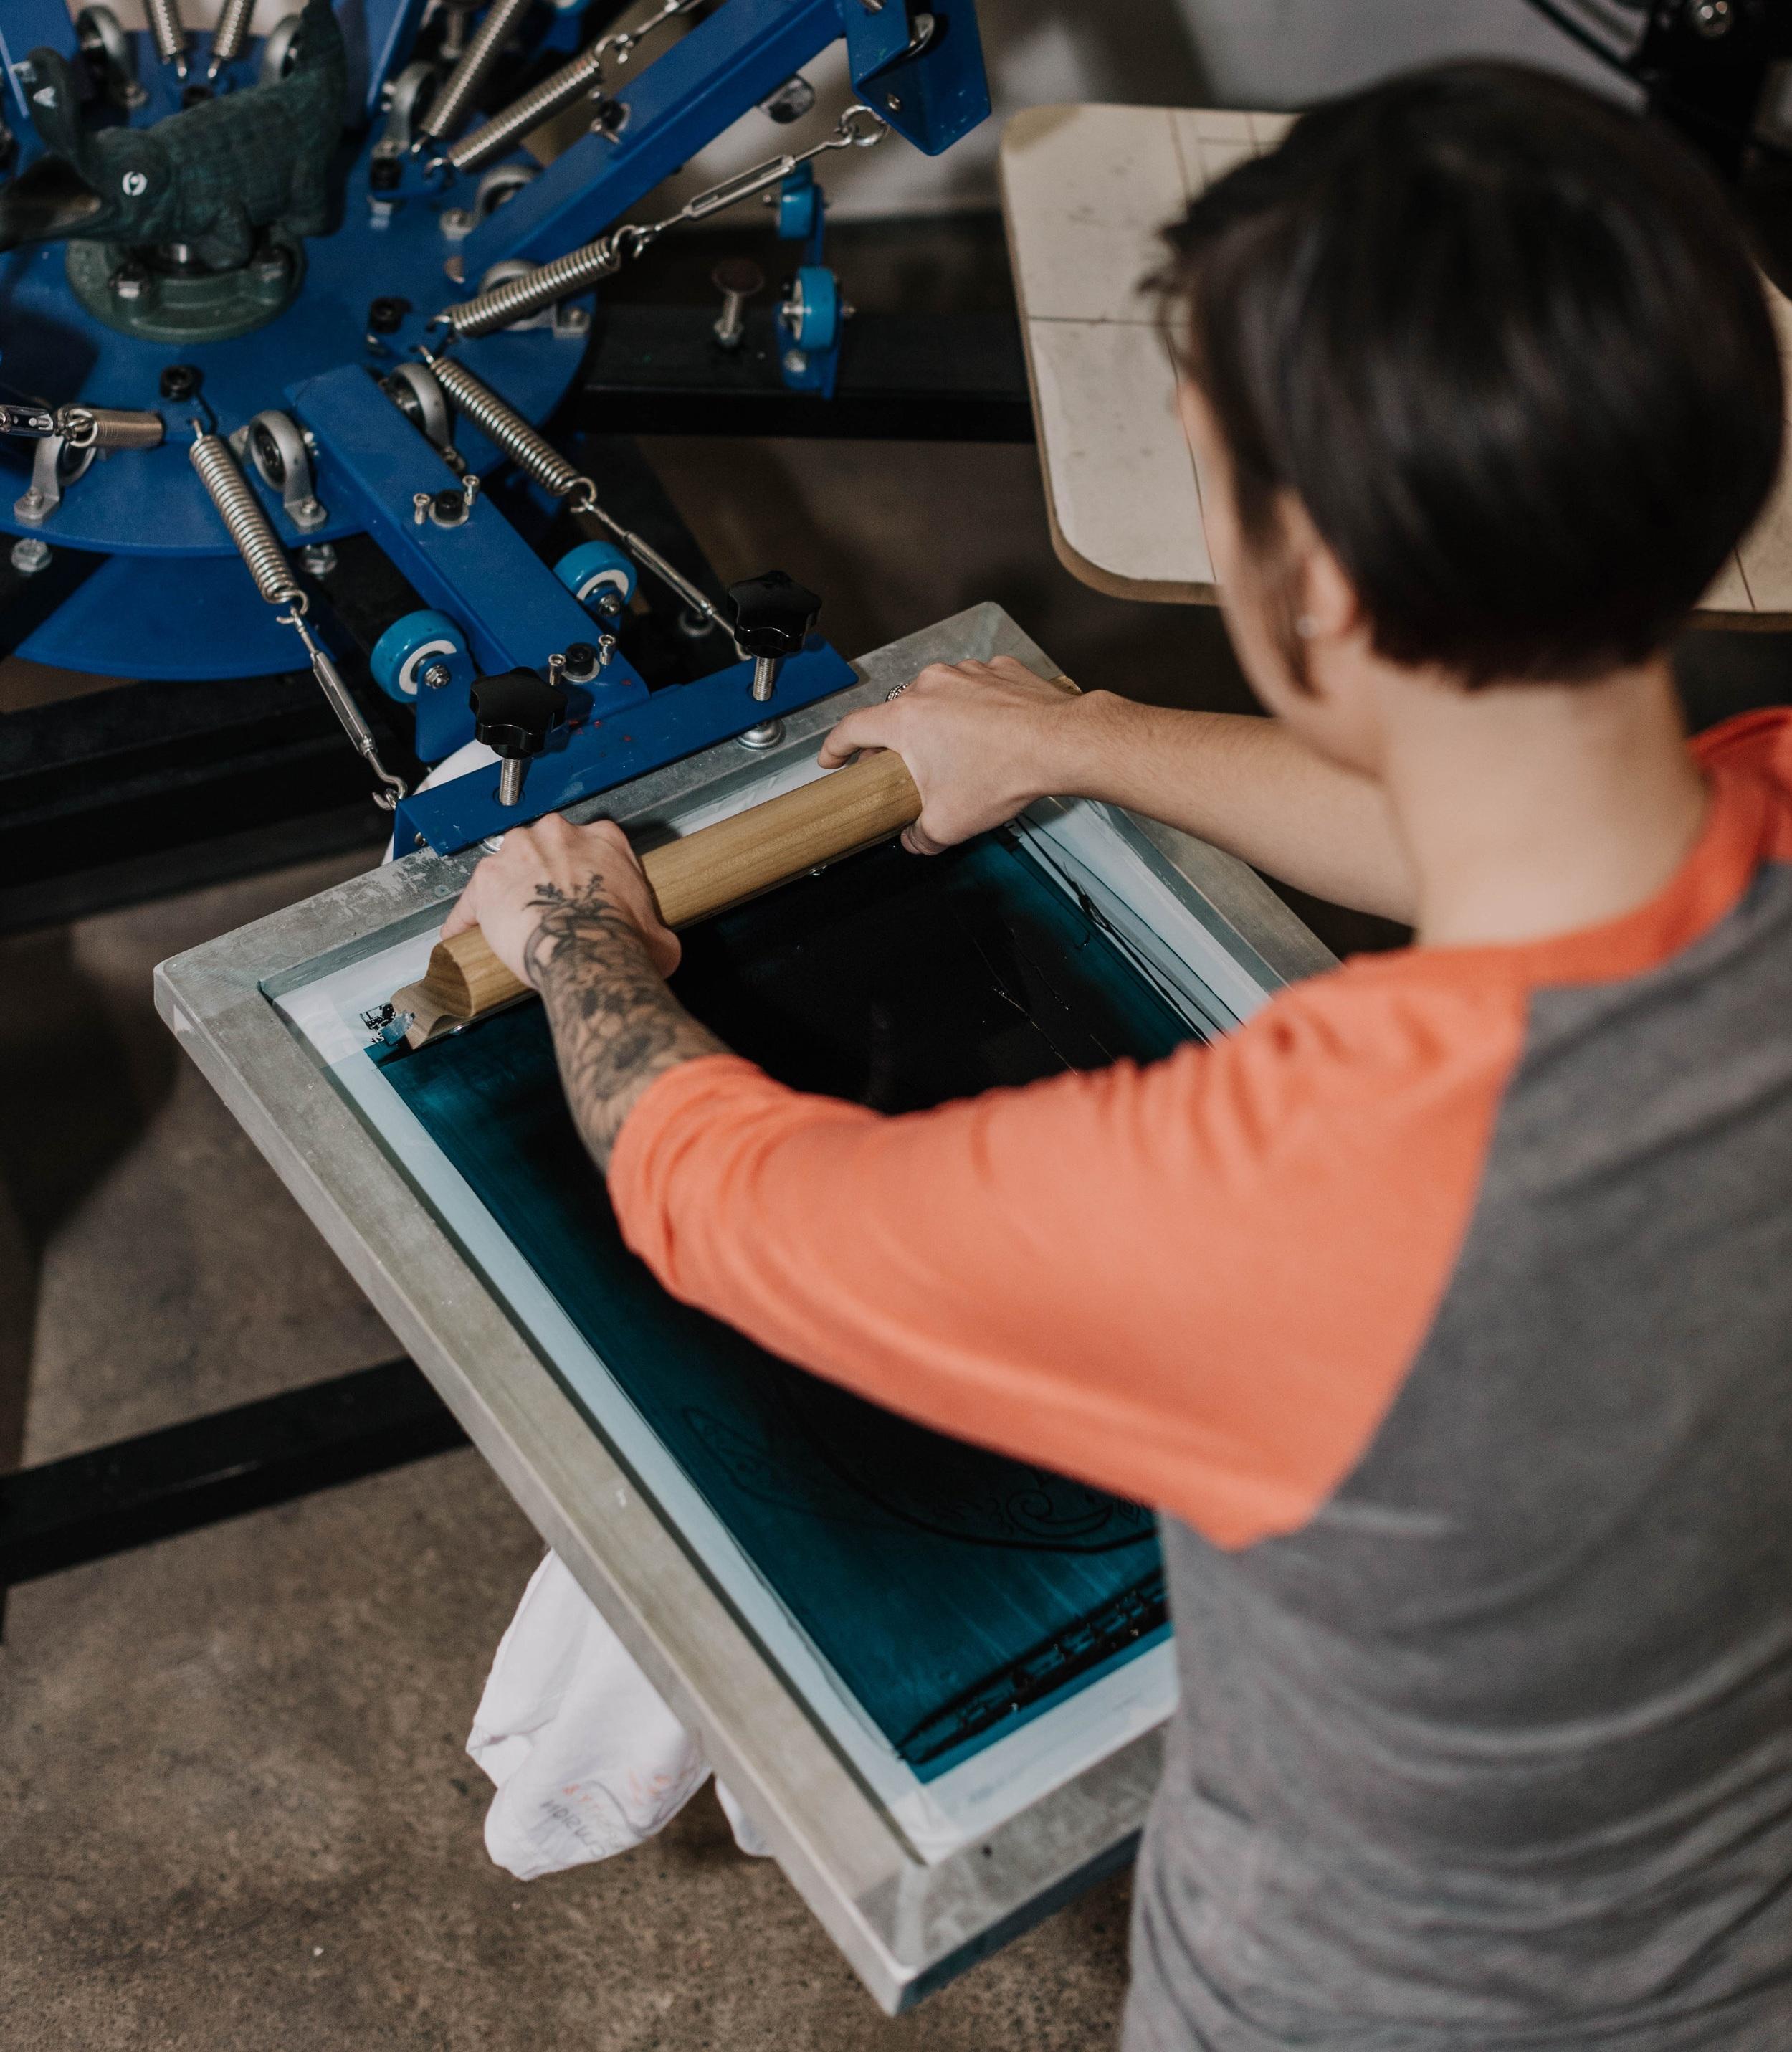 Using t-shirt press